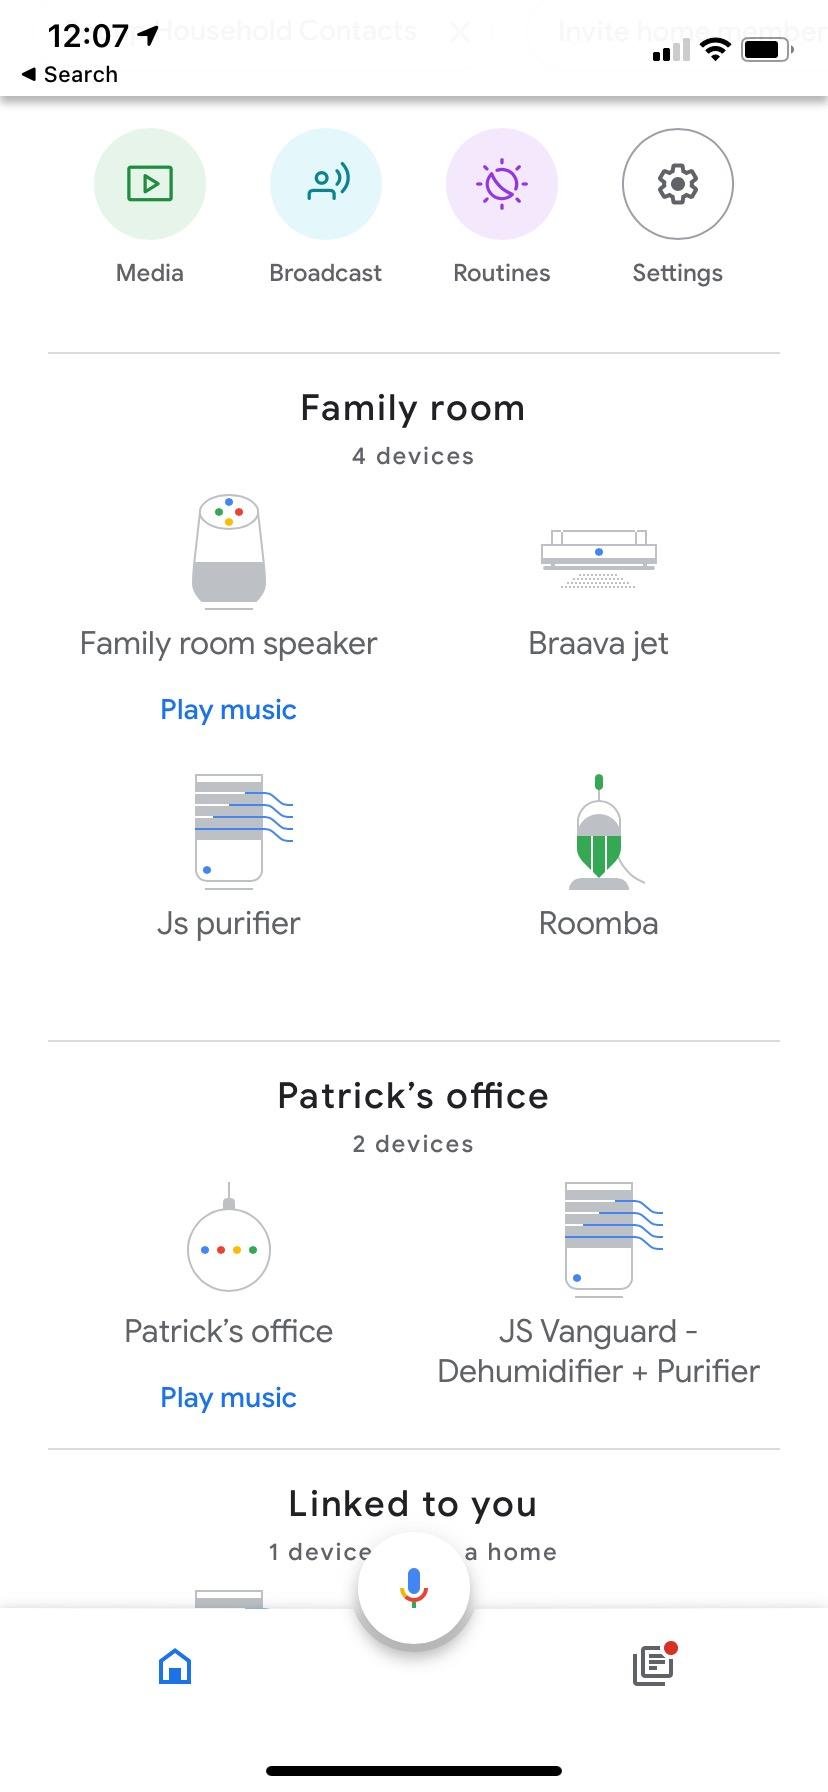 JS Flo Vanguard 2.0 Google Home app